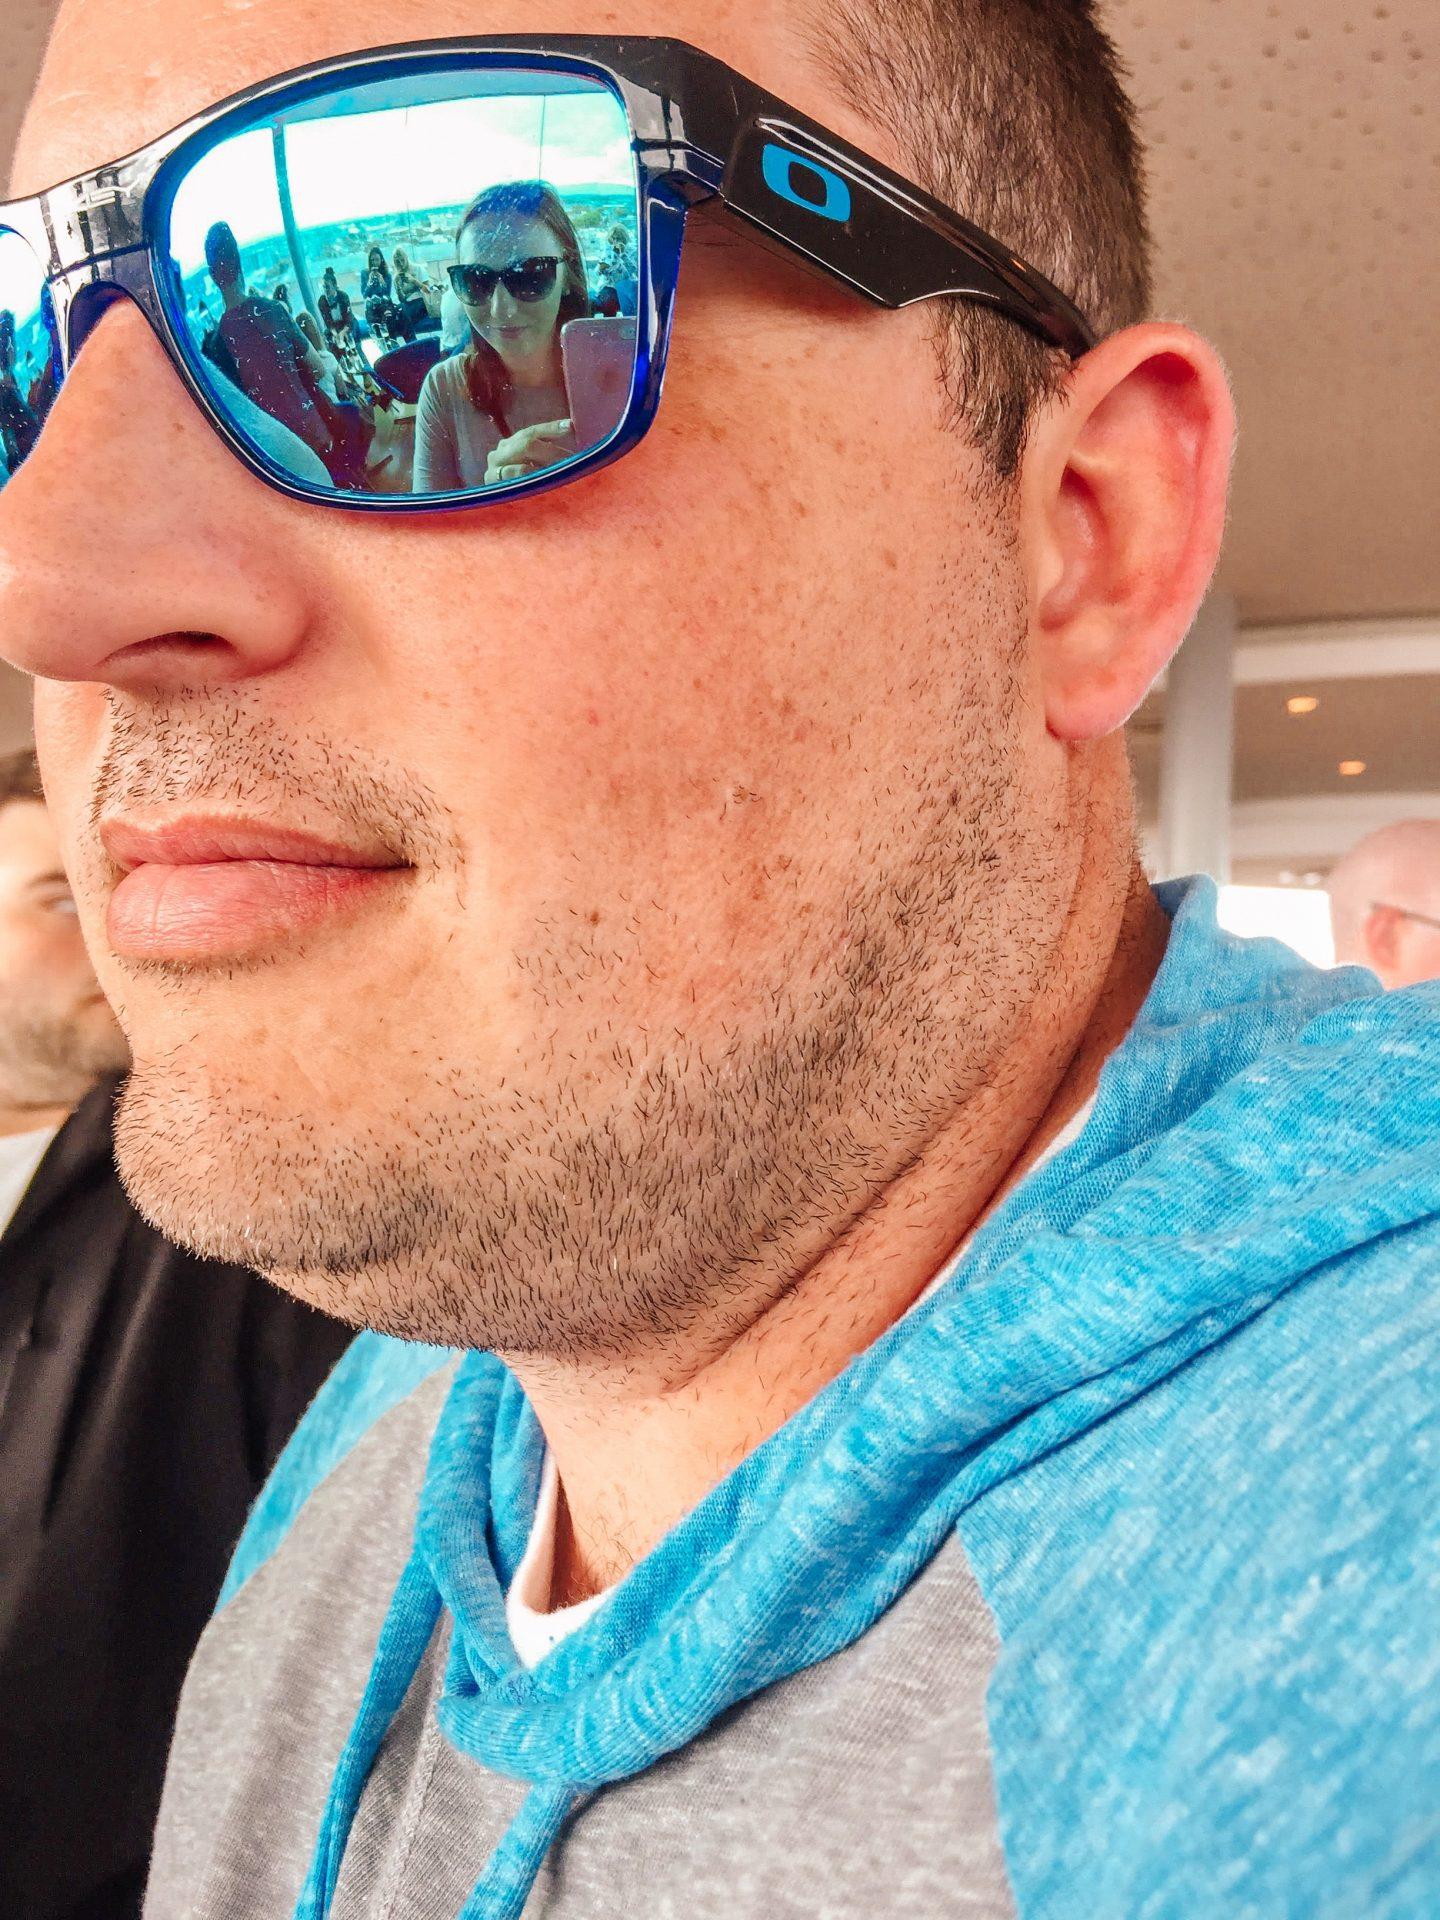 Reflection of woman at beer bar in her husband's sunglasses. Gravity Bar Guinness Storehouse Dublin Ireland. European Beer Travel.